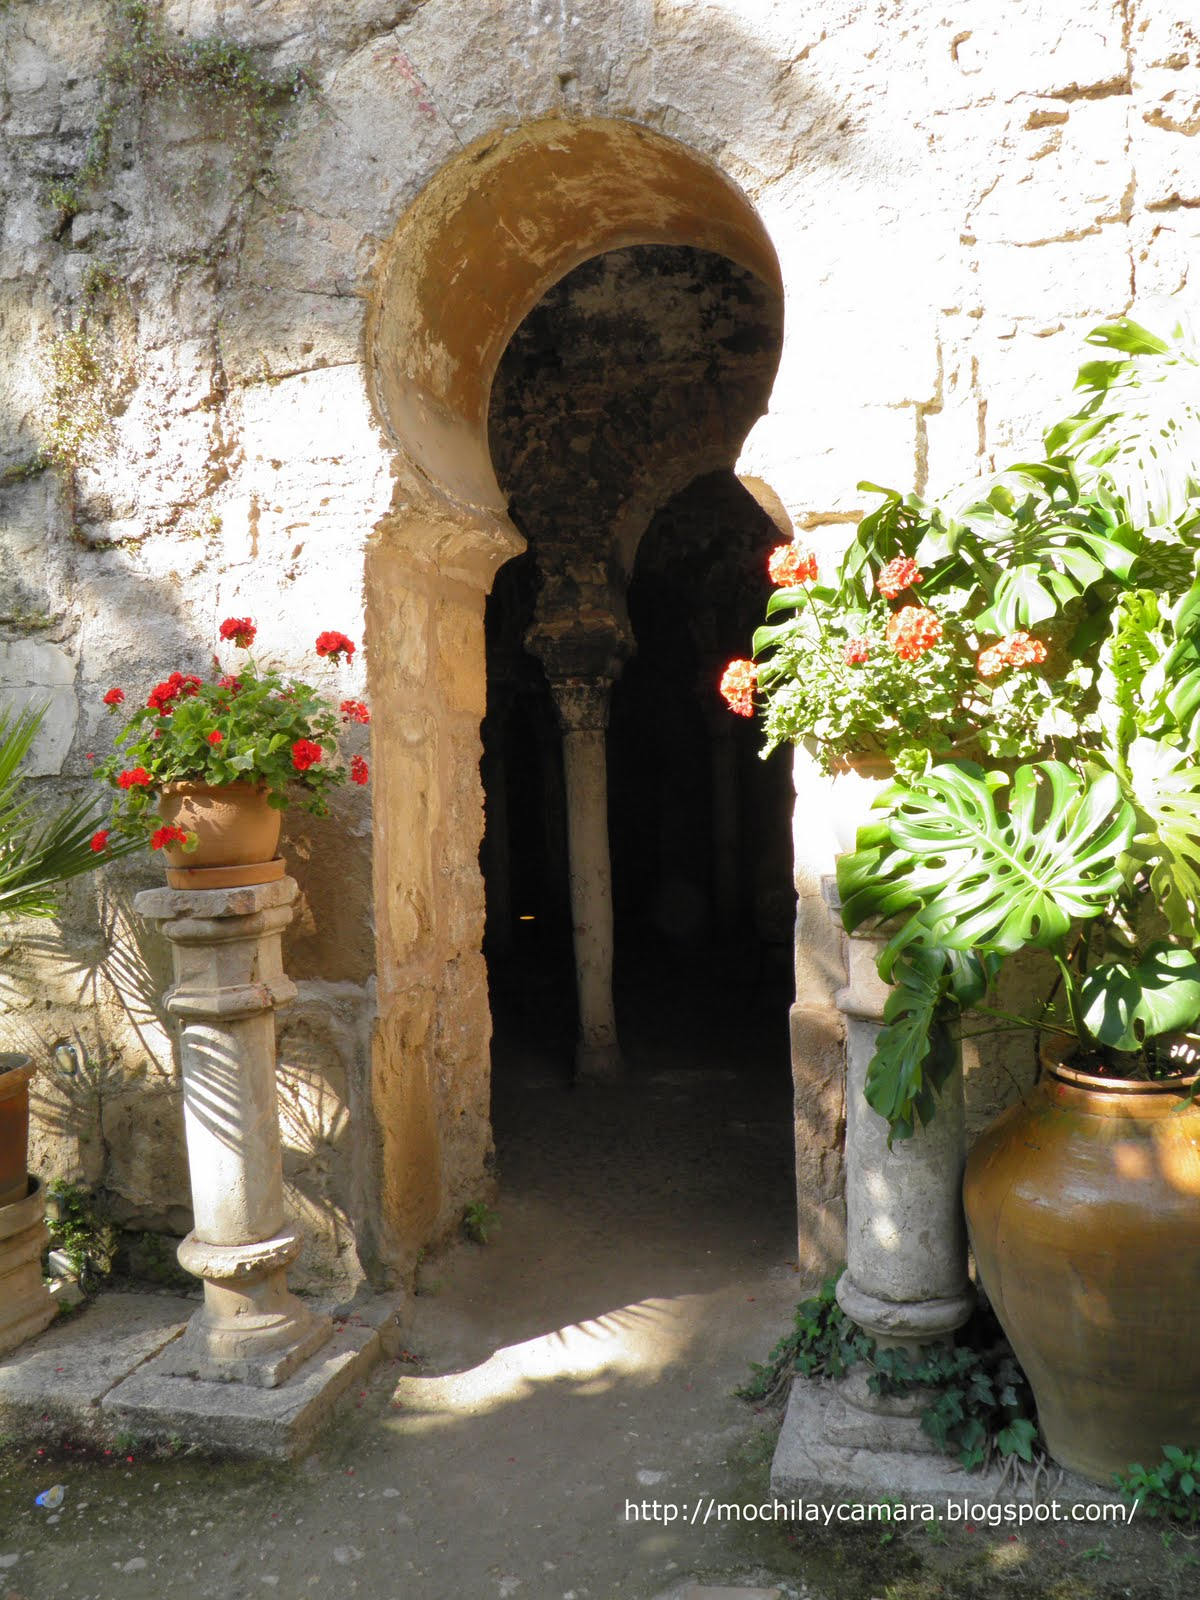 Baños Arabes Mallorca:Mochila y Camara: Los baños árabes de Palma de Mallorca